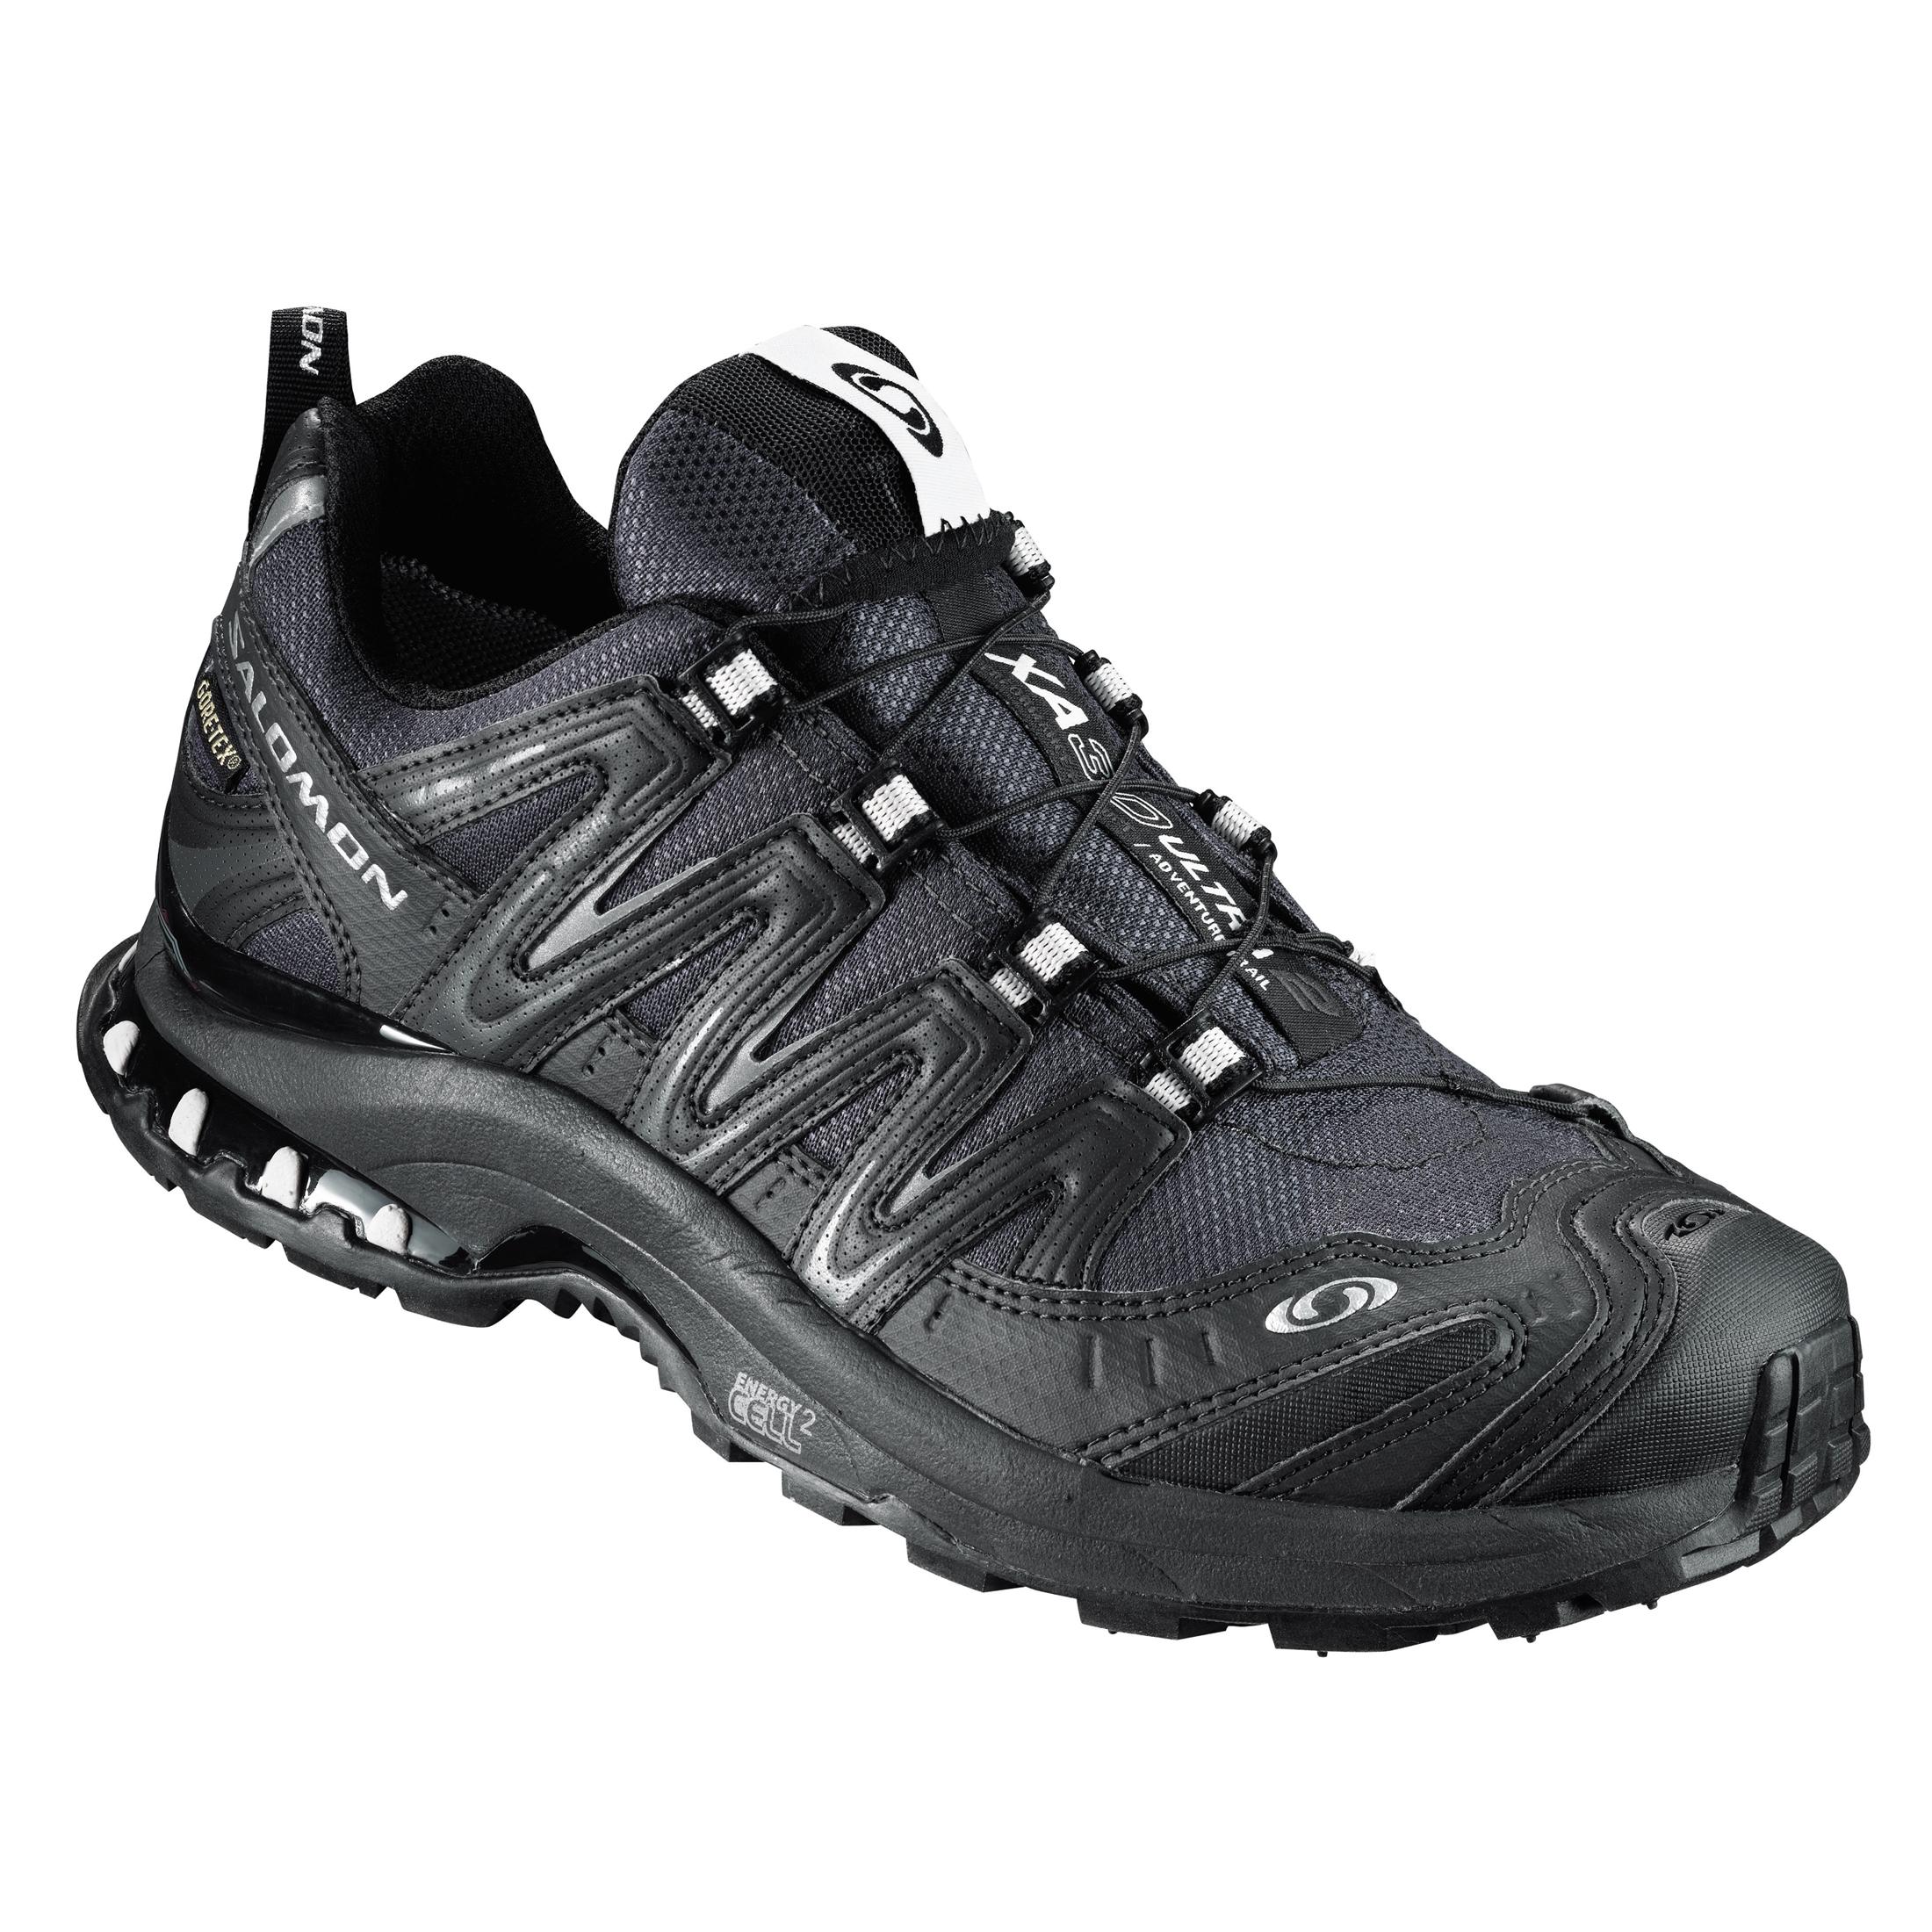 ab959016a Salomon XA PRO 3D Ultra 2 GTX pánská krosová obuv černá   Sport ...